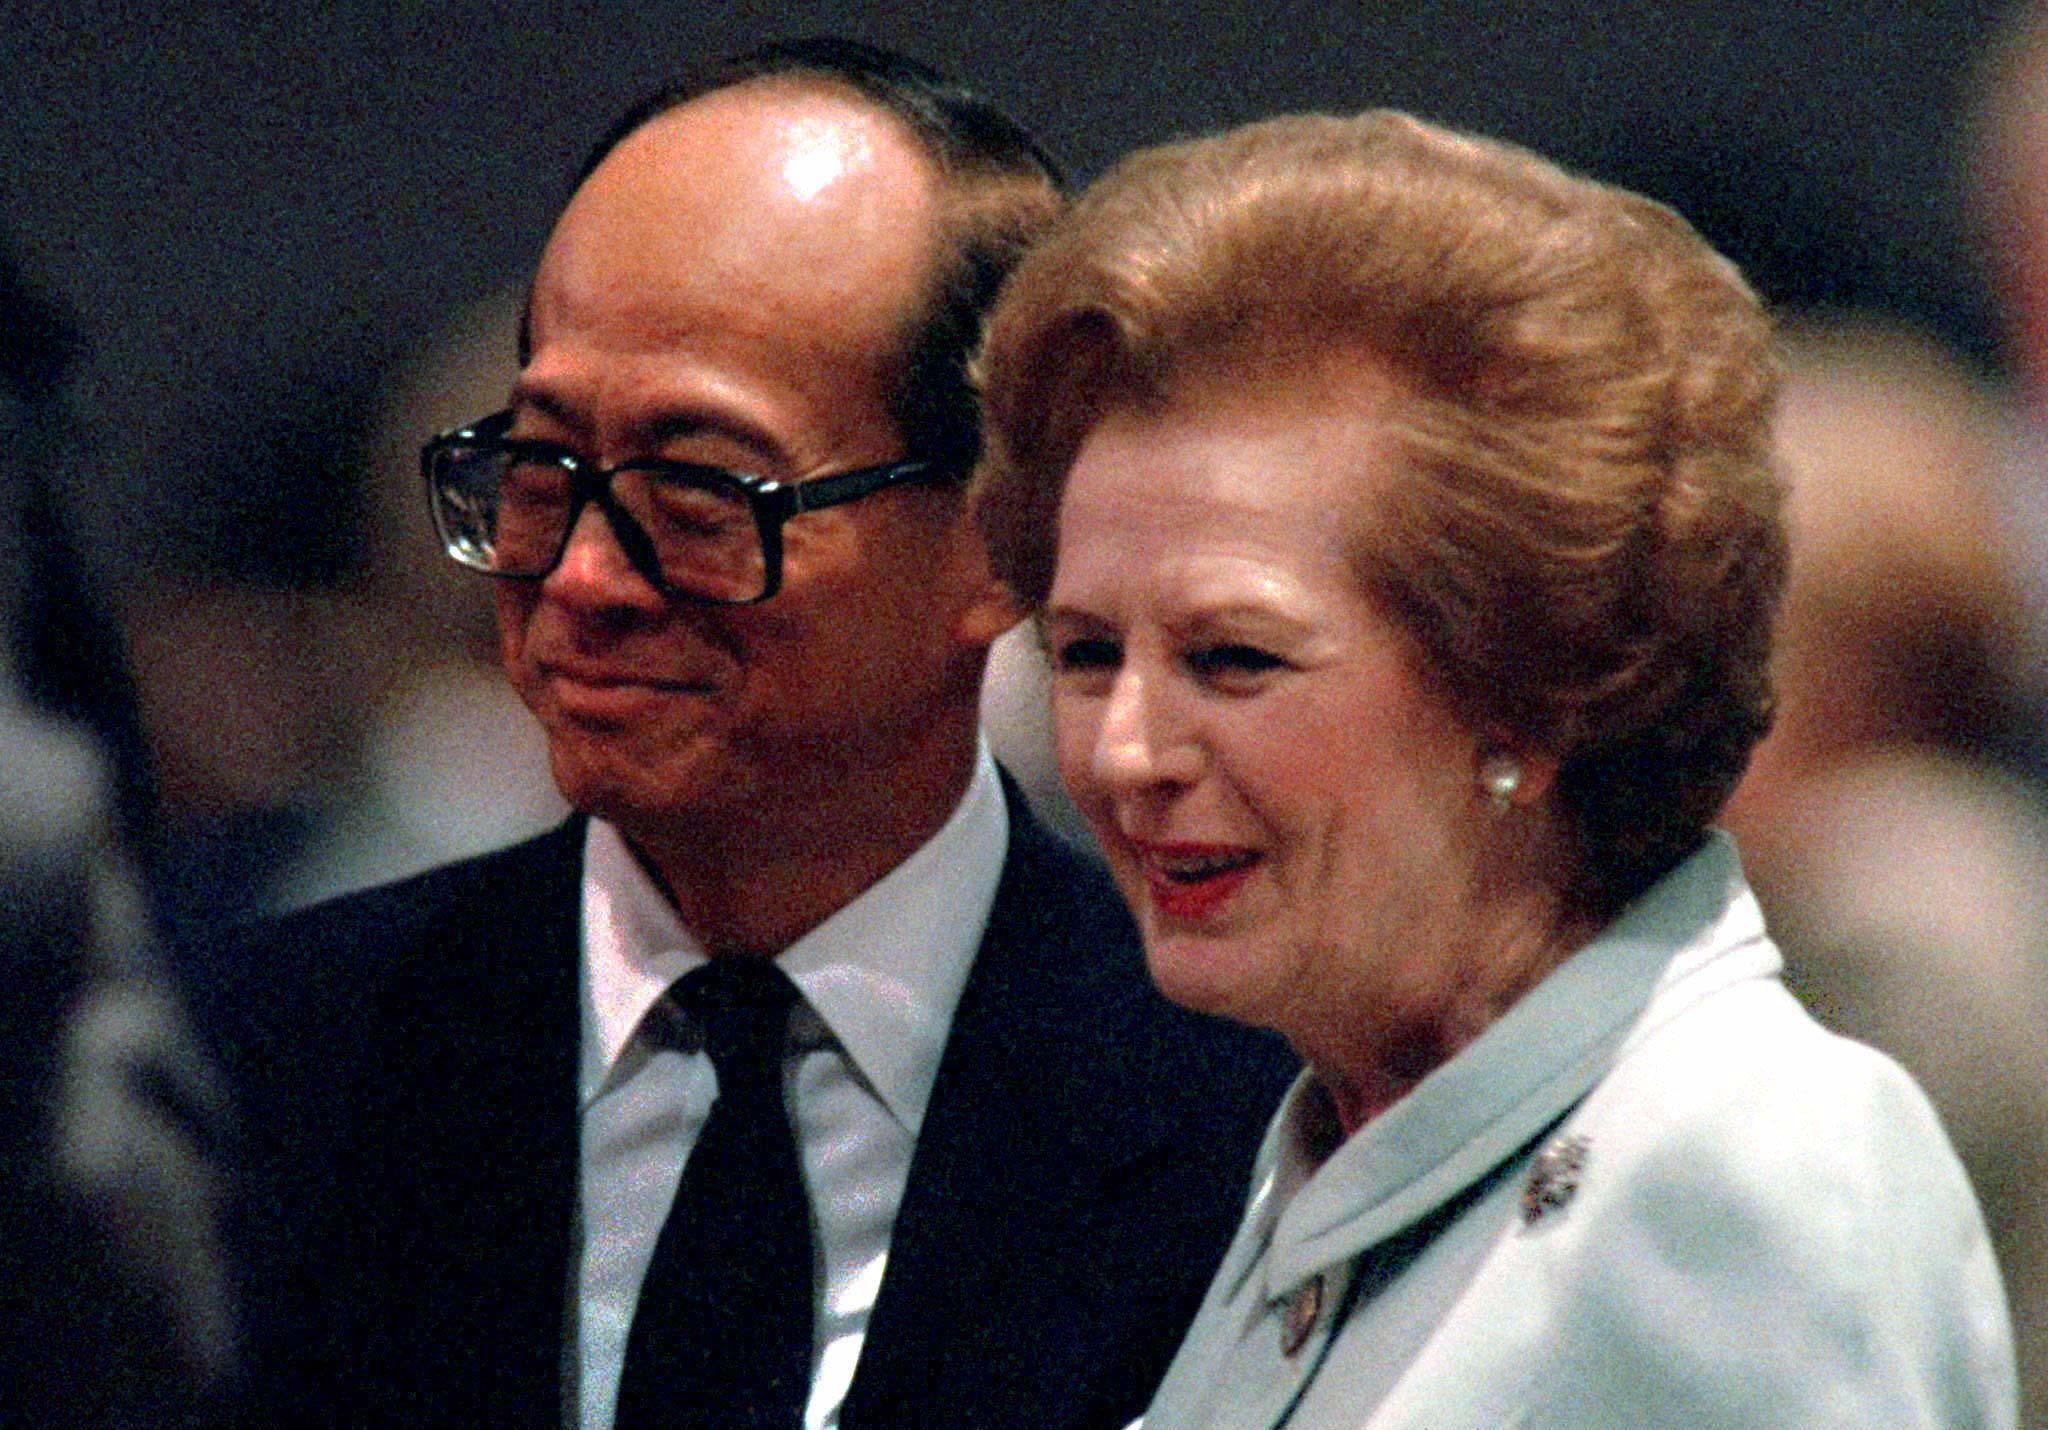 Li Ka-shing and Margaret Thatcher